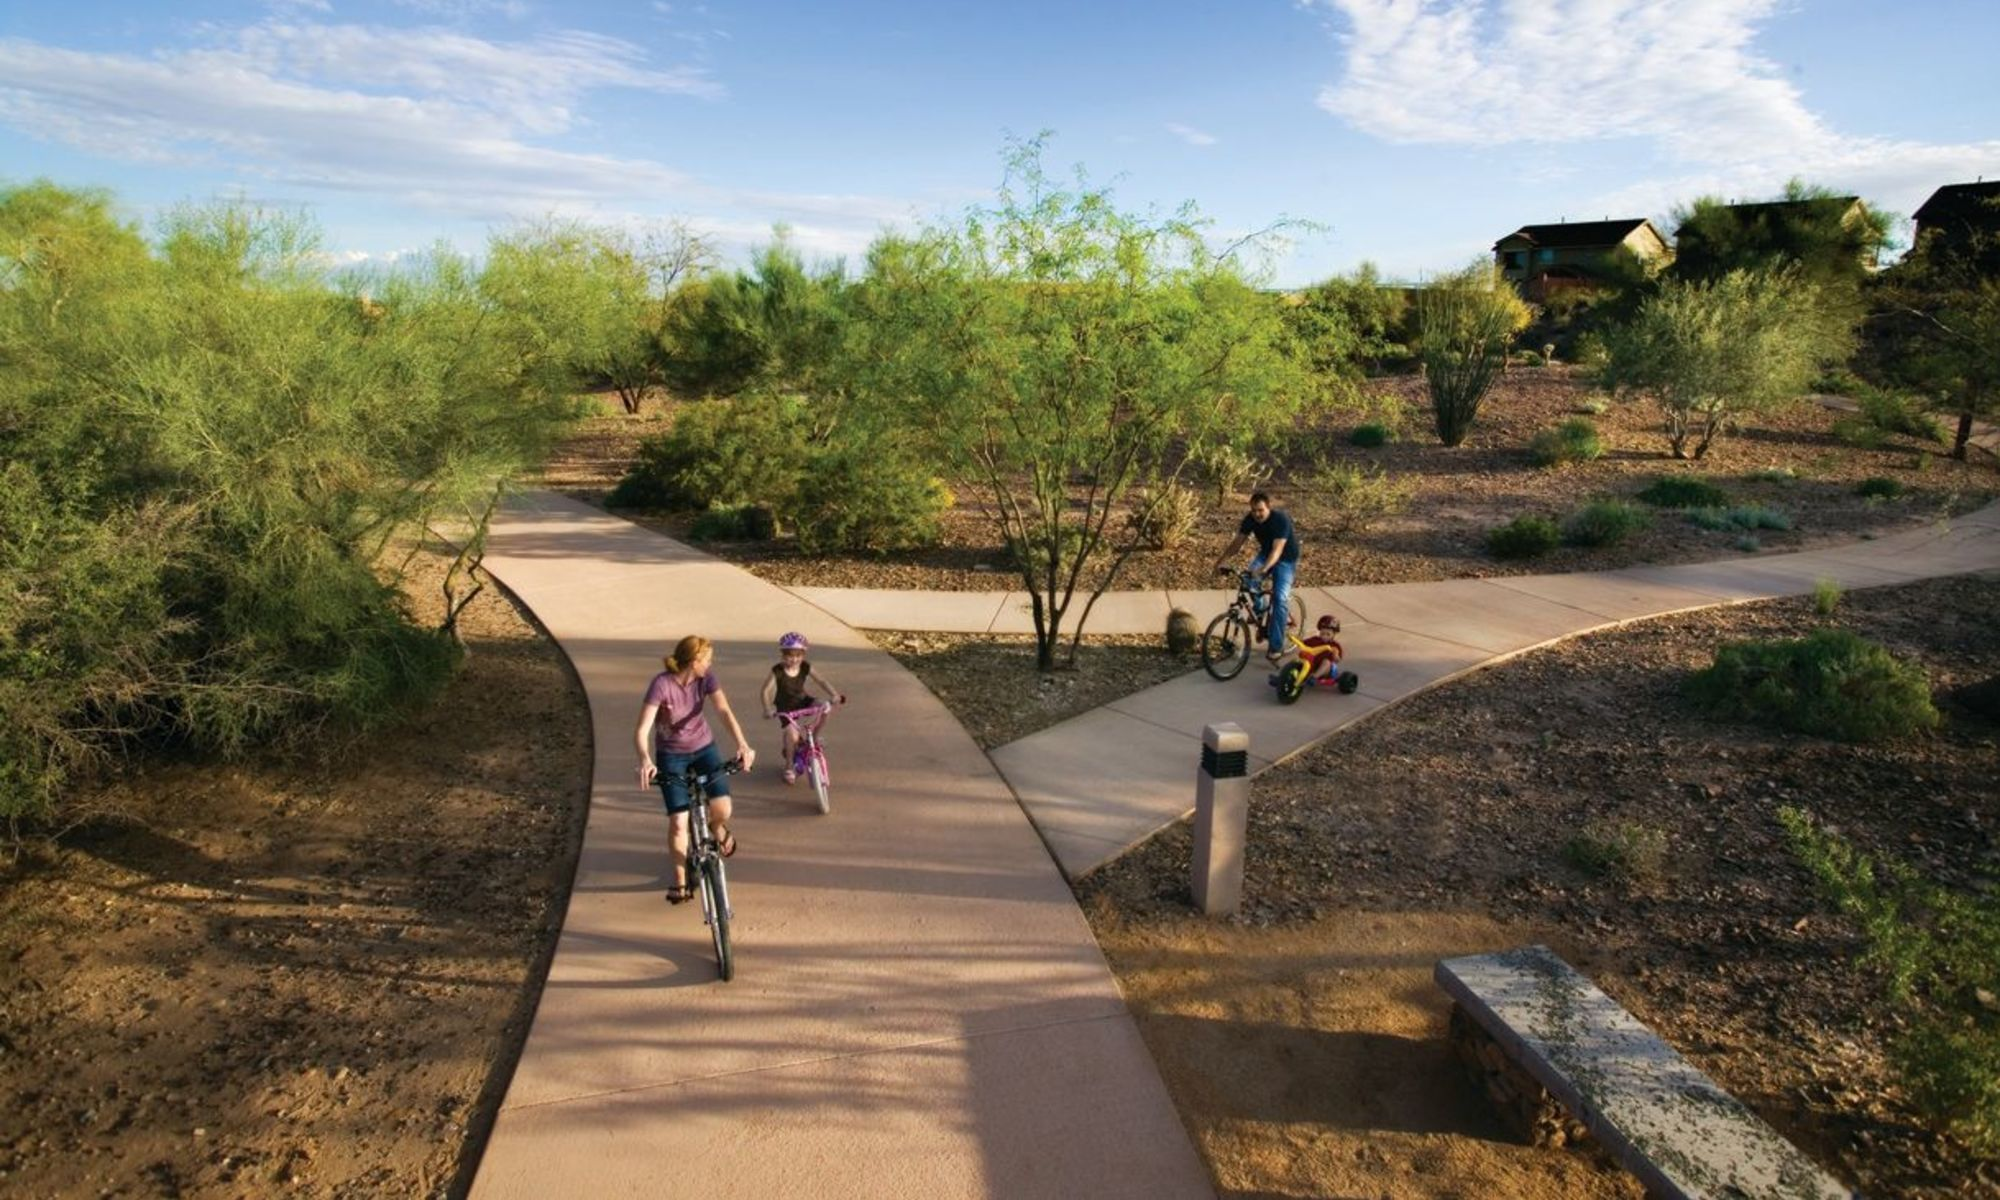 Townhomes in Peoria, Arizona at BB Living at Vistancia